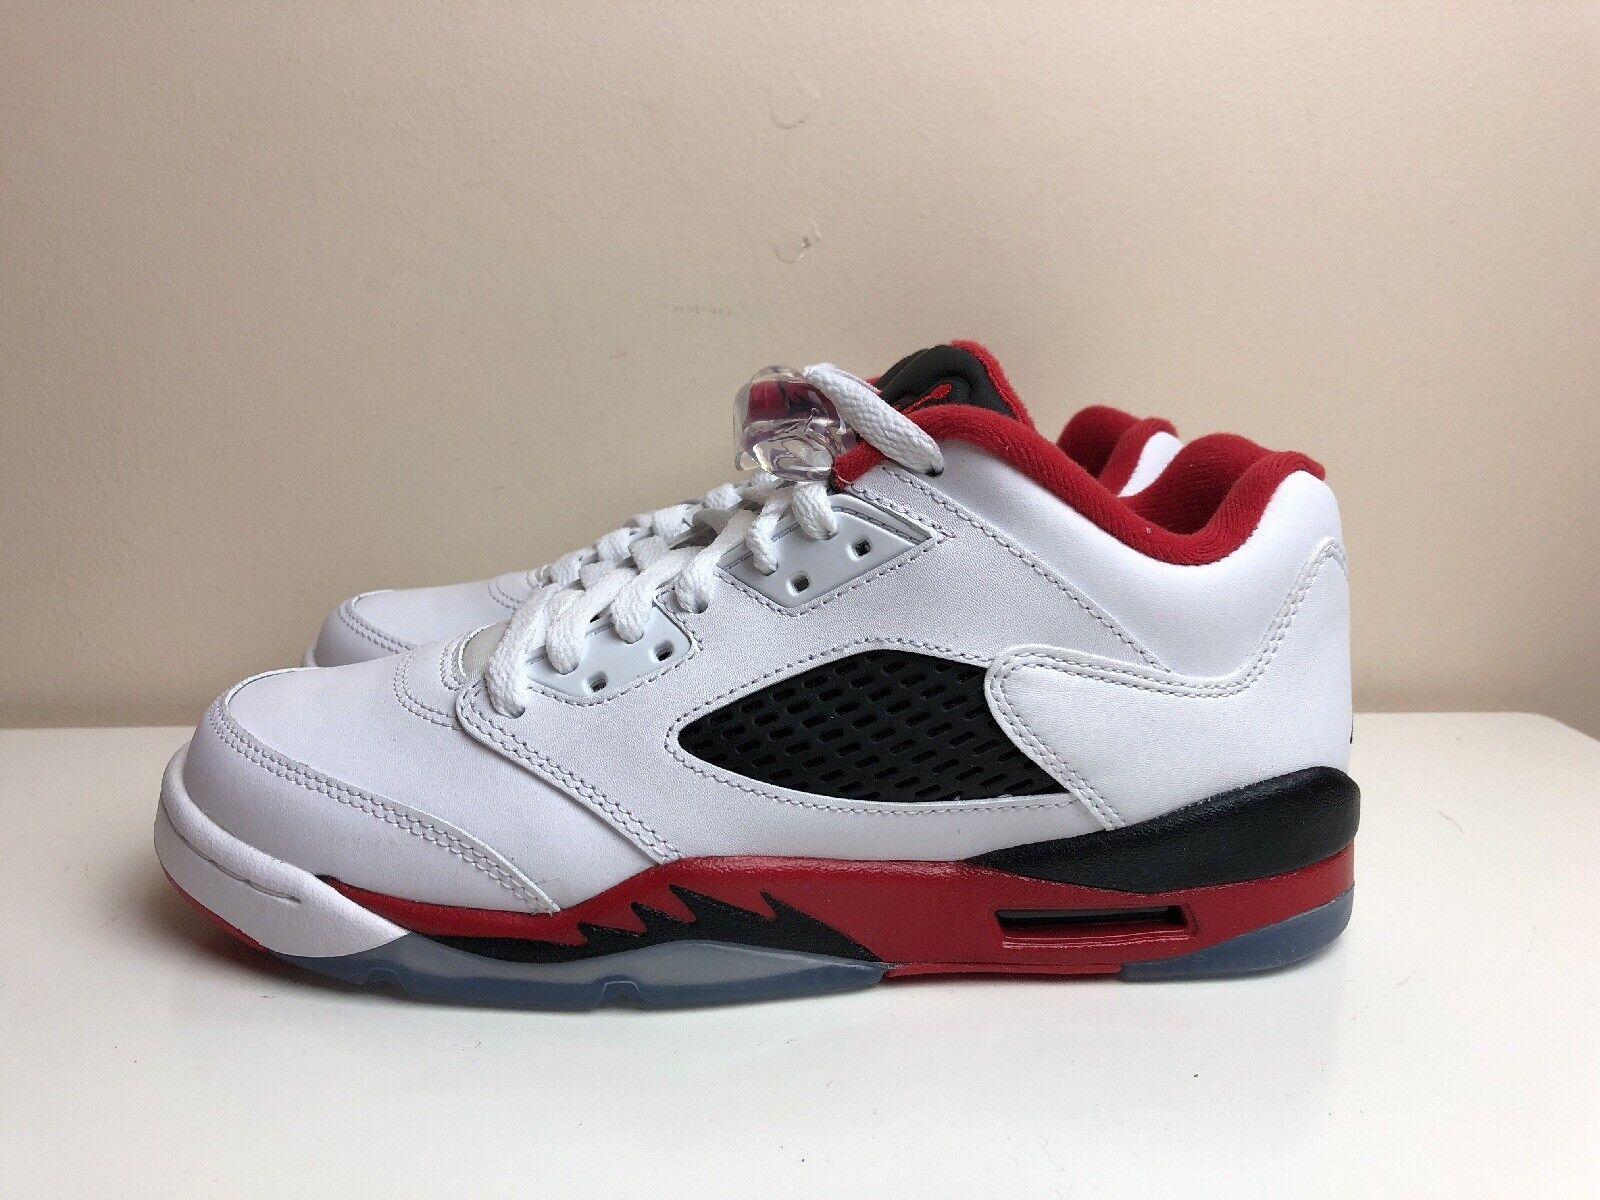 Nike Air Jordan 5 Retro Retro Retro Low Gs Scarpe Bianco Rosso EUR 39 314338 101 | Ricca consegna puntuale  | Ideale economico  4123e2